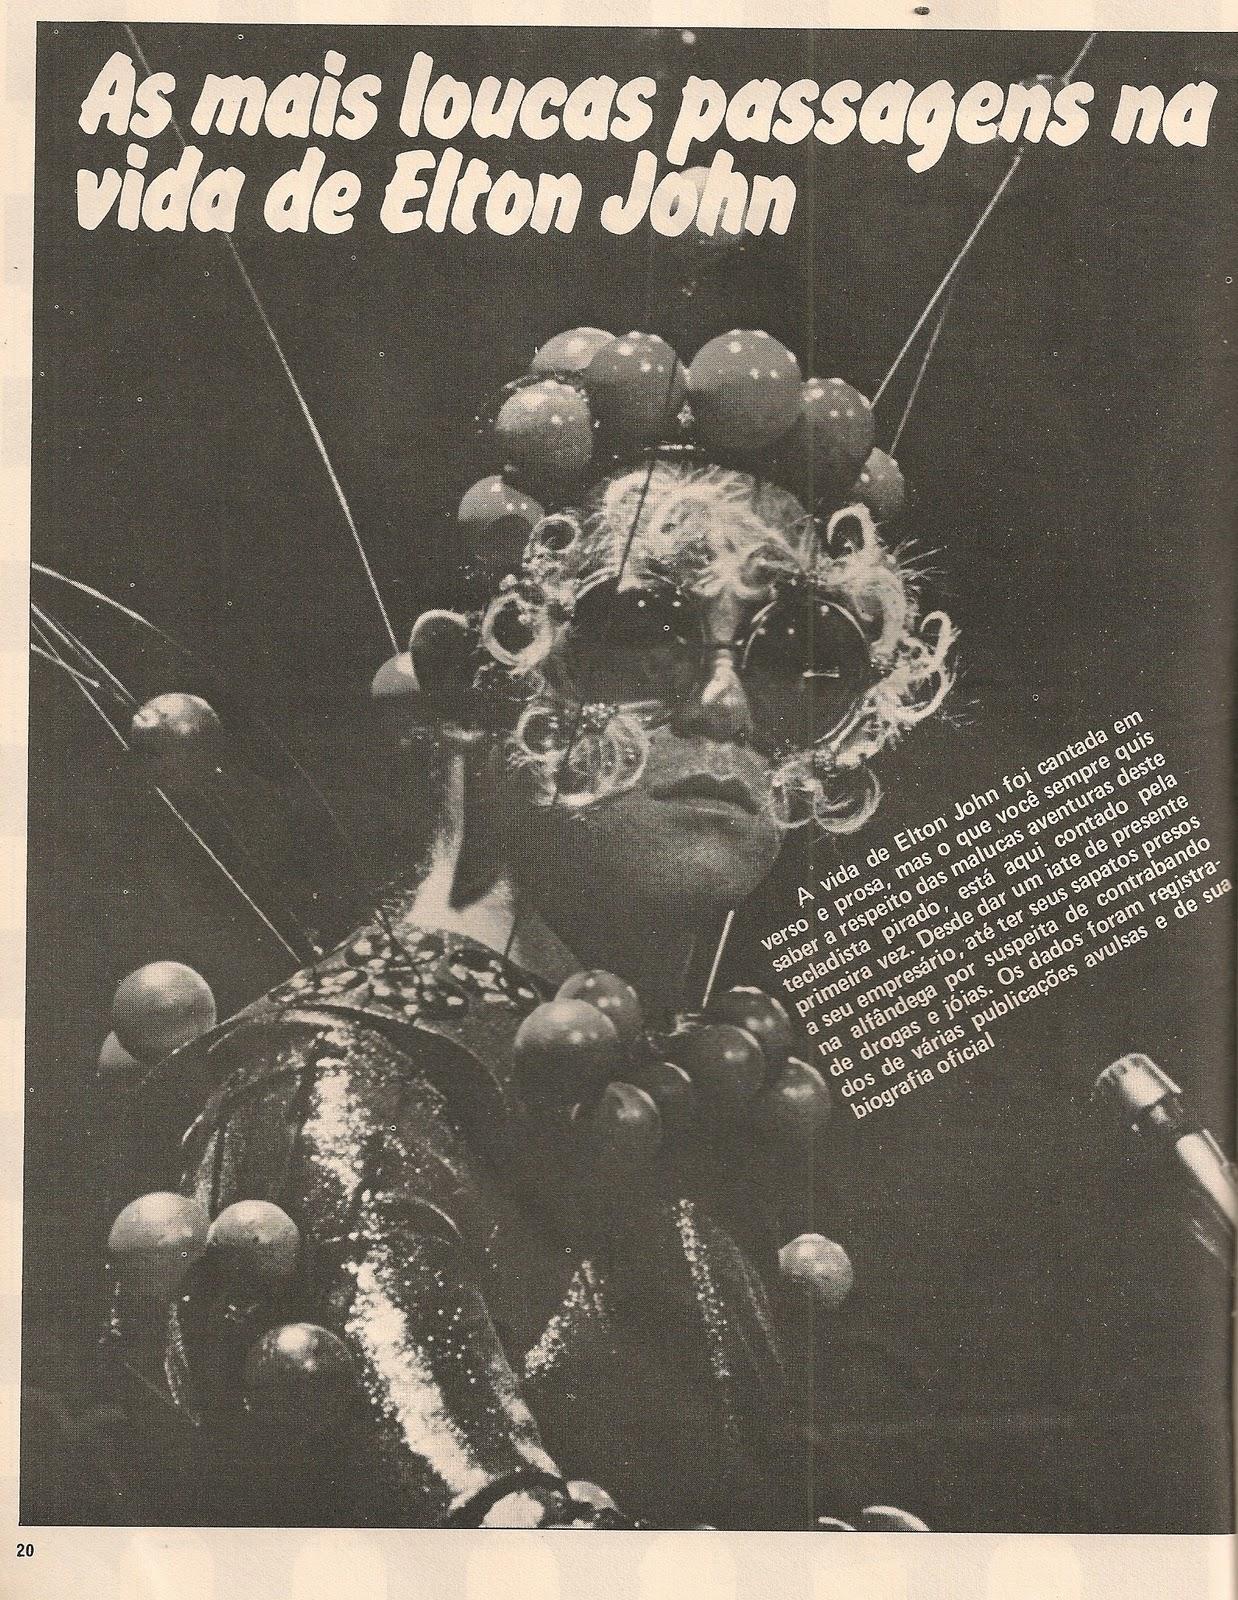 http://4.bp.blogspot.com/_8ISXckLbuXk/TRJNFs2qc6I/AAAAAAAADqI/0sZYVUHIEss/s1600/Elton+John%252C+As+mais+loucas+passagens+na+vida+de+Elton+John+-+M%25C3%25BAsica+1978-07+-+01.jpg